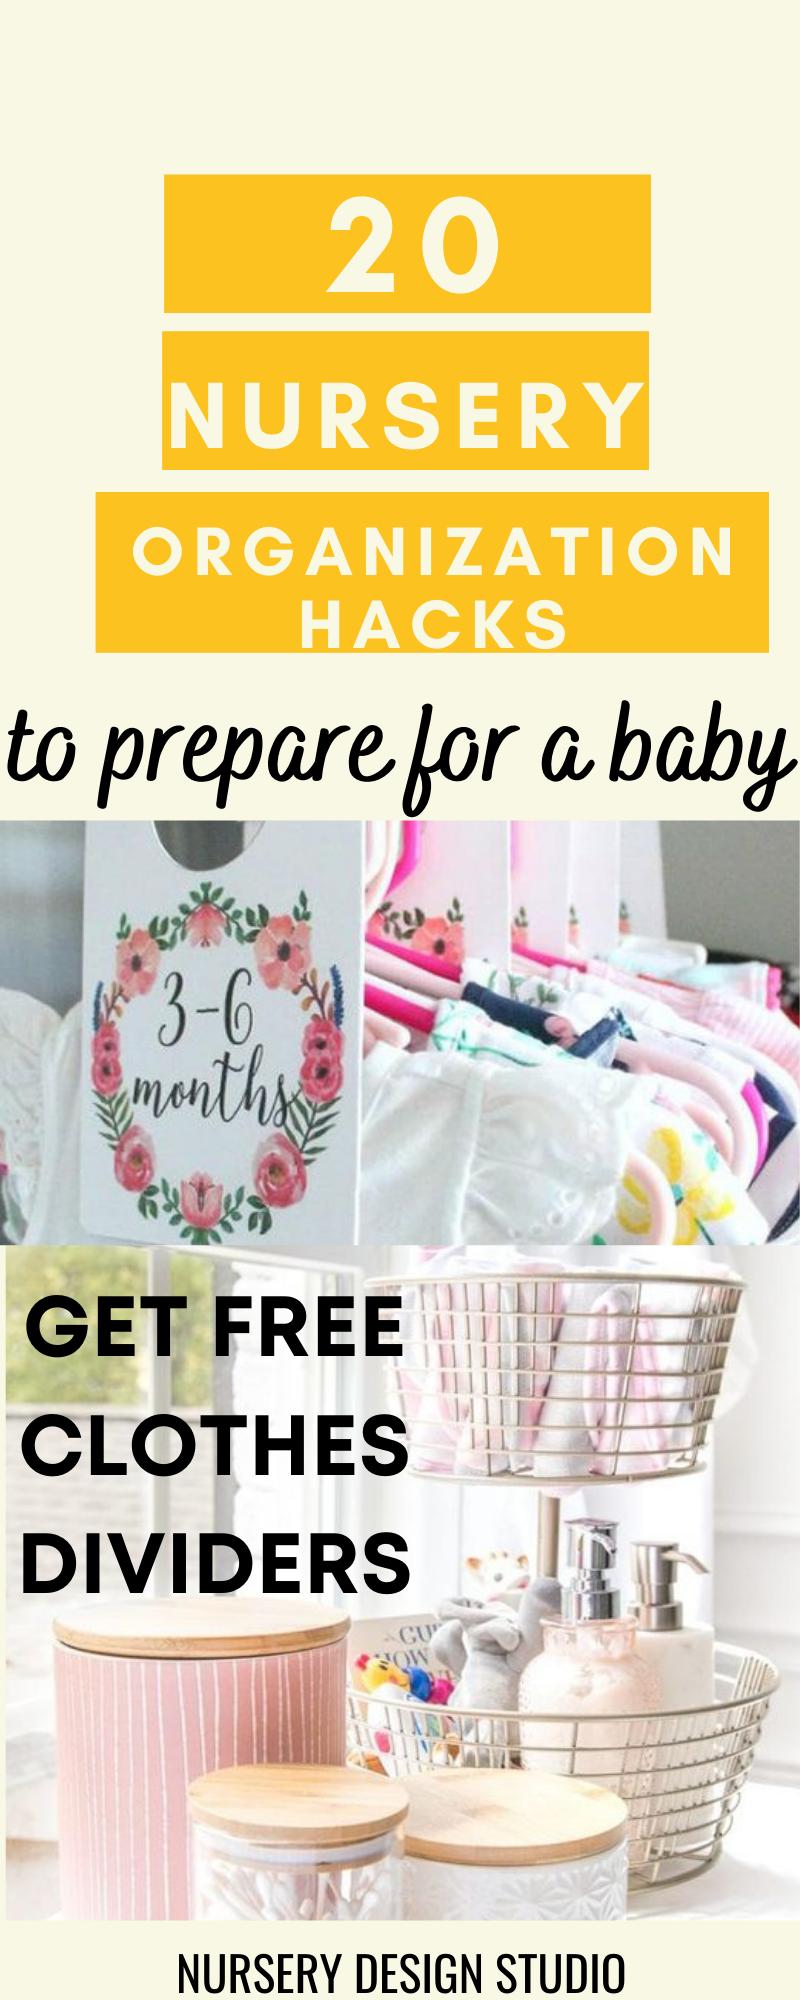 nursery organization hacks